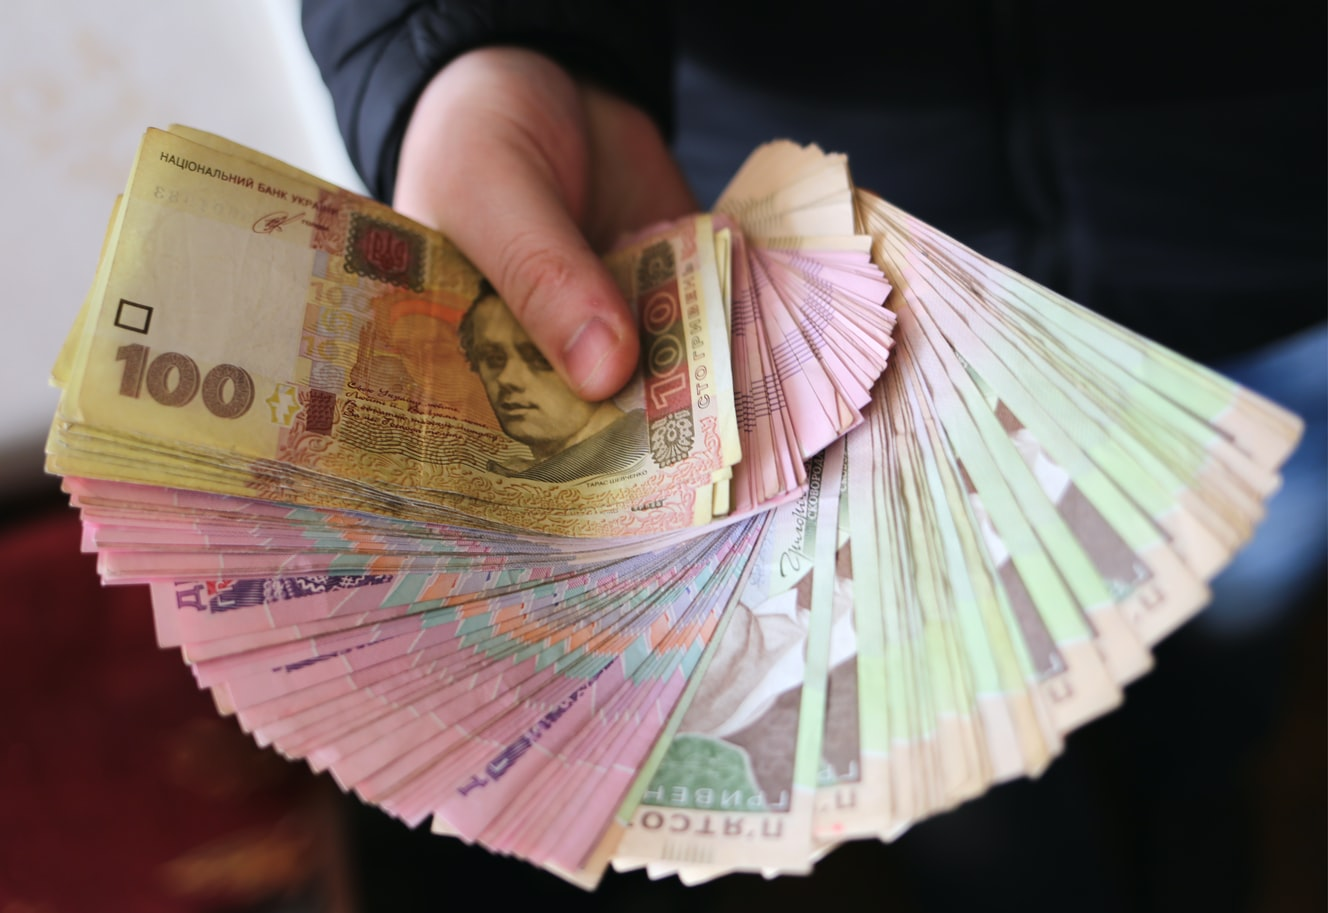 guegabut - 4 Manfaat Menyimpan Emas Ketimbang Uang Dalam Jangka Panjang